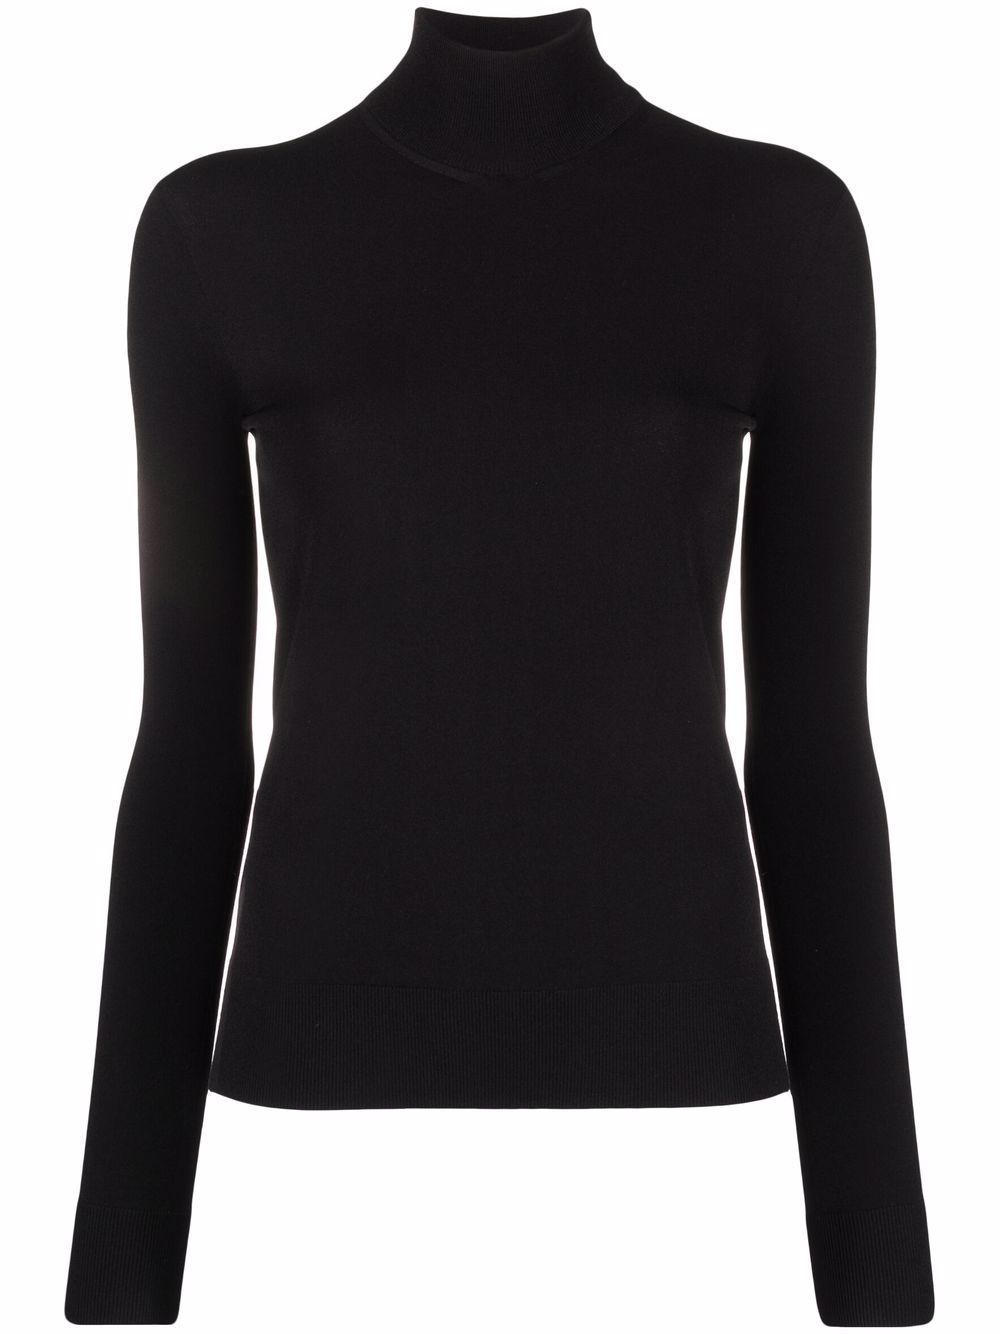 Bottega veneta sweaters black